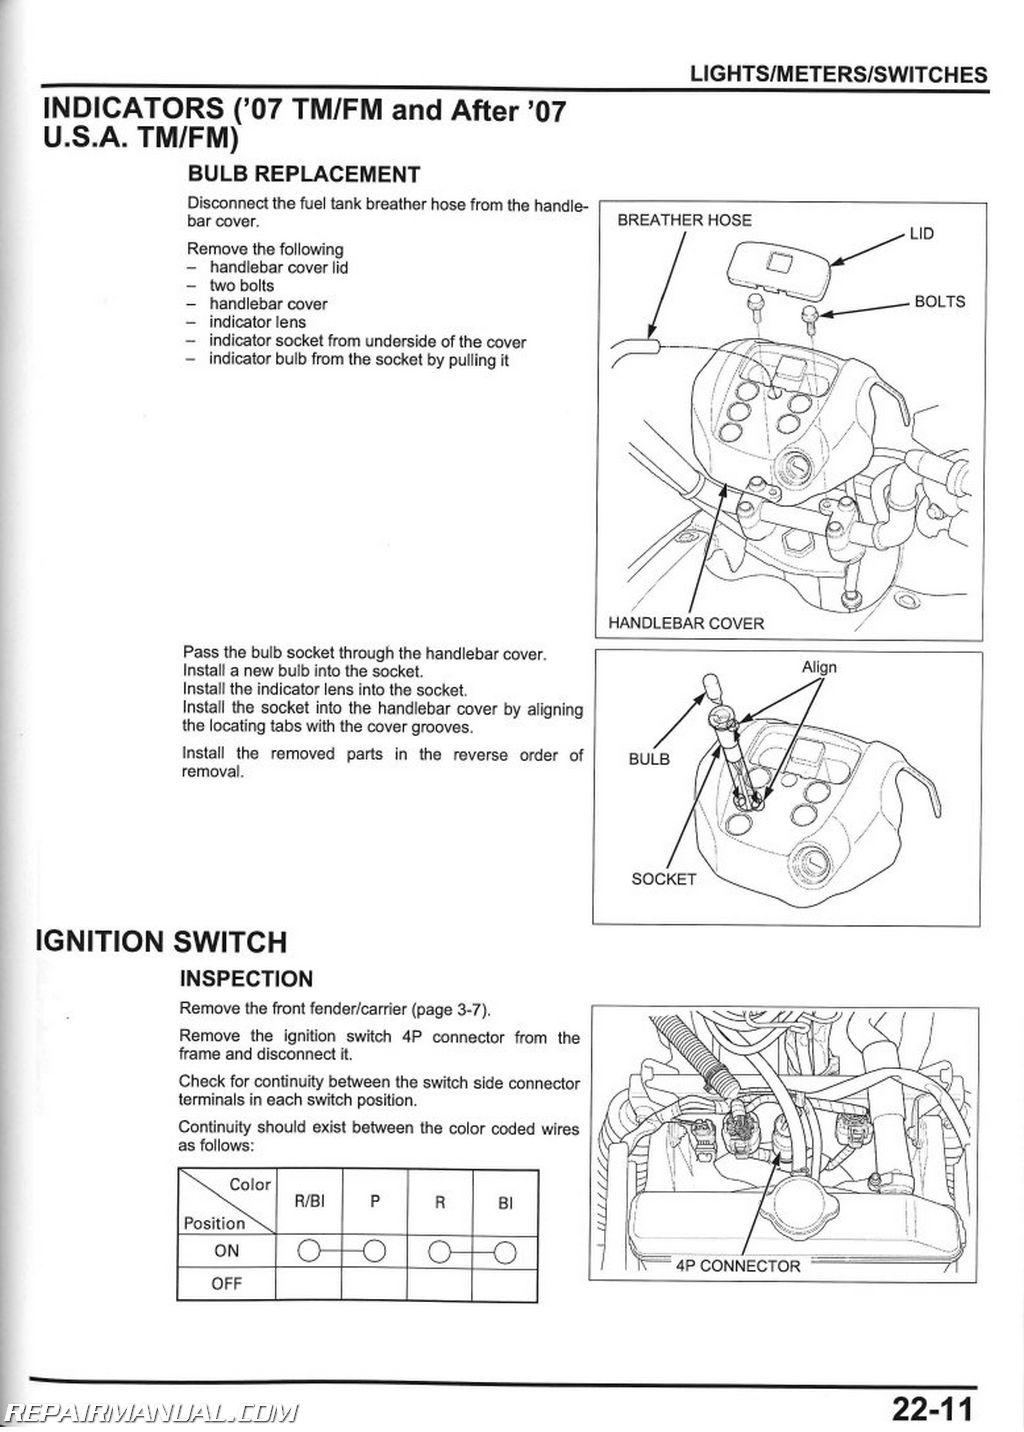 2005 Honda Rancher Ignition Switch Wiring Wrangler Tj Wiring Diagram Yamaha Phazer Sampaibila Jeanjaures37 Fr